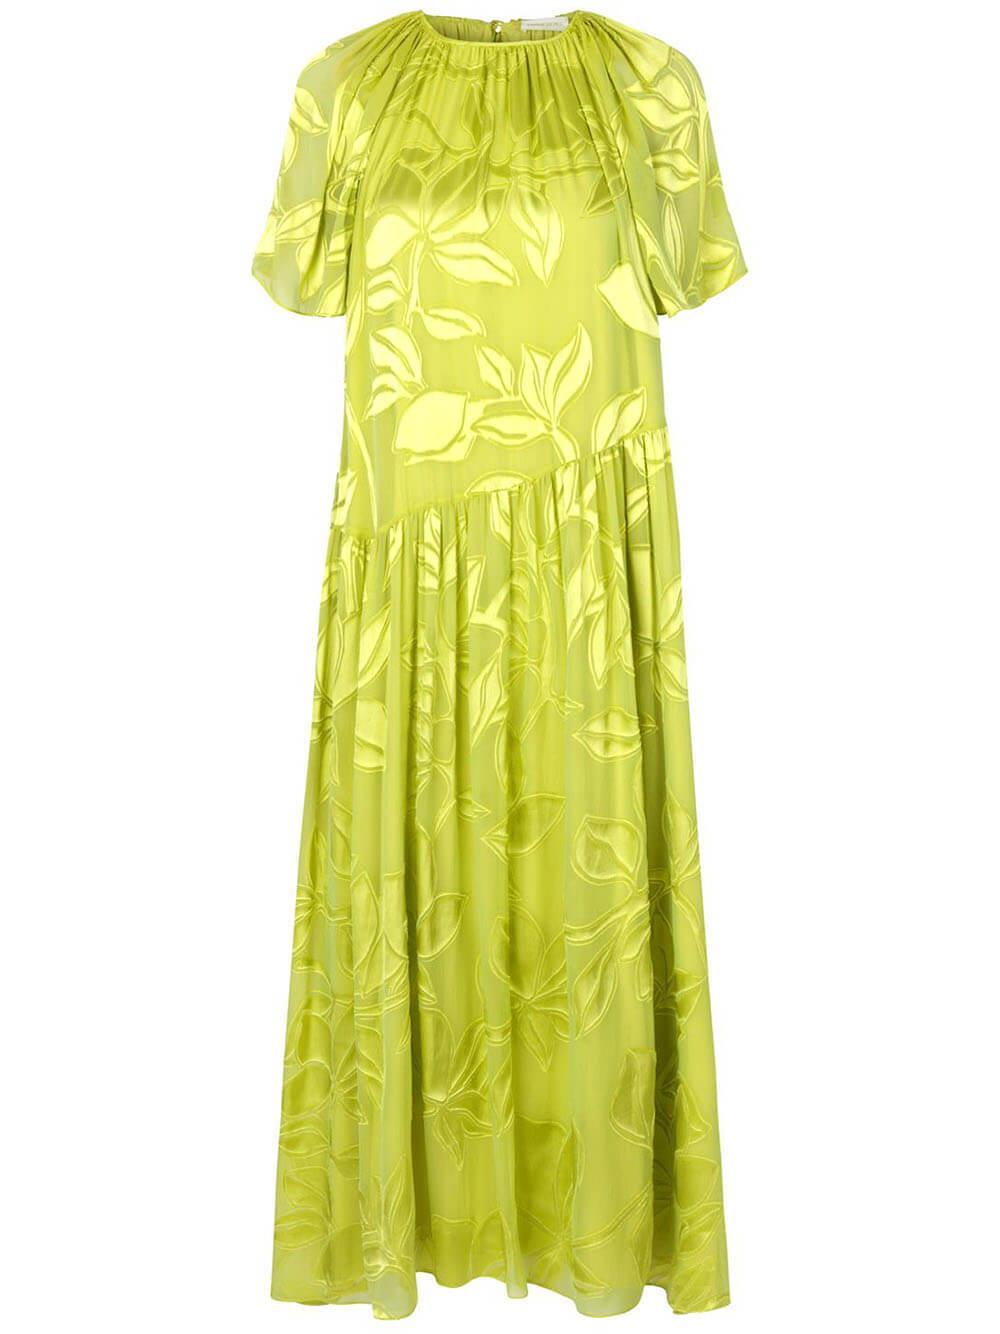 Addyson Dress